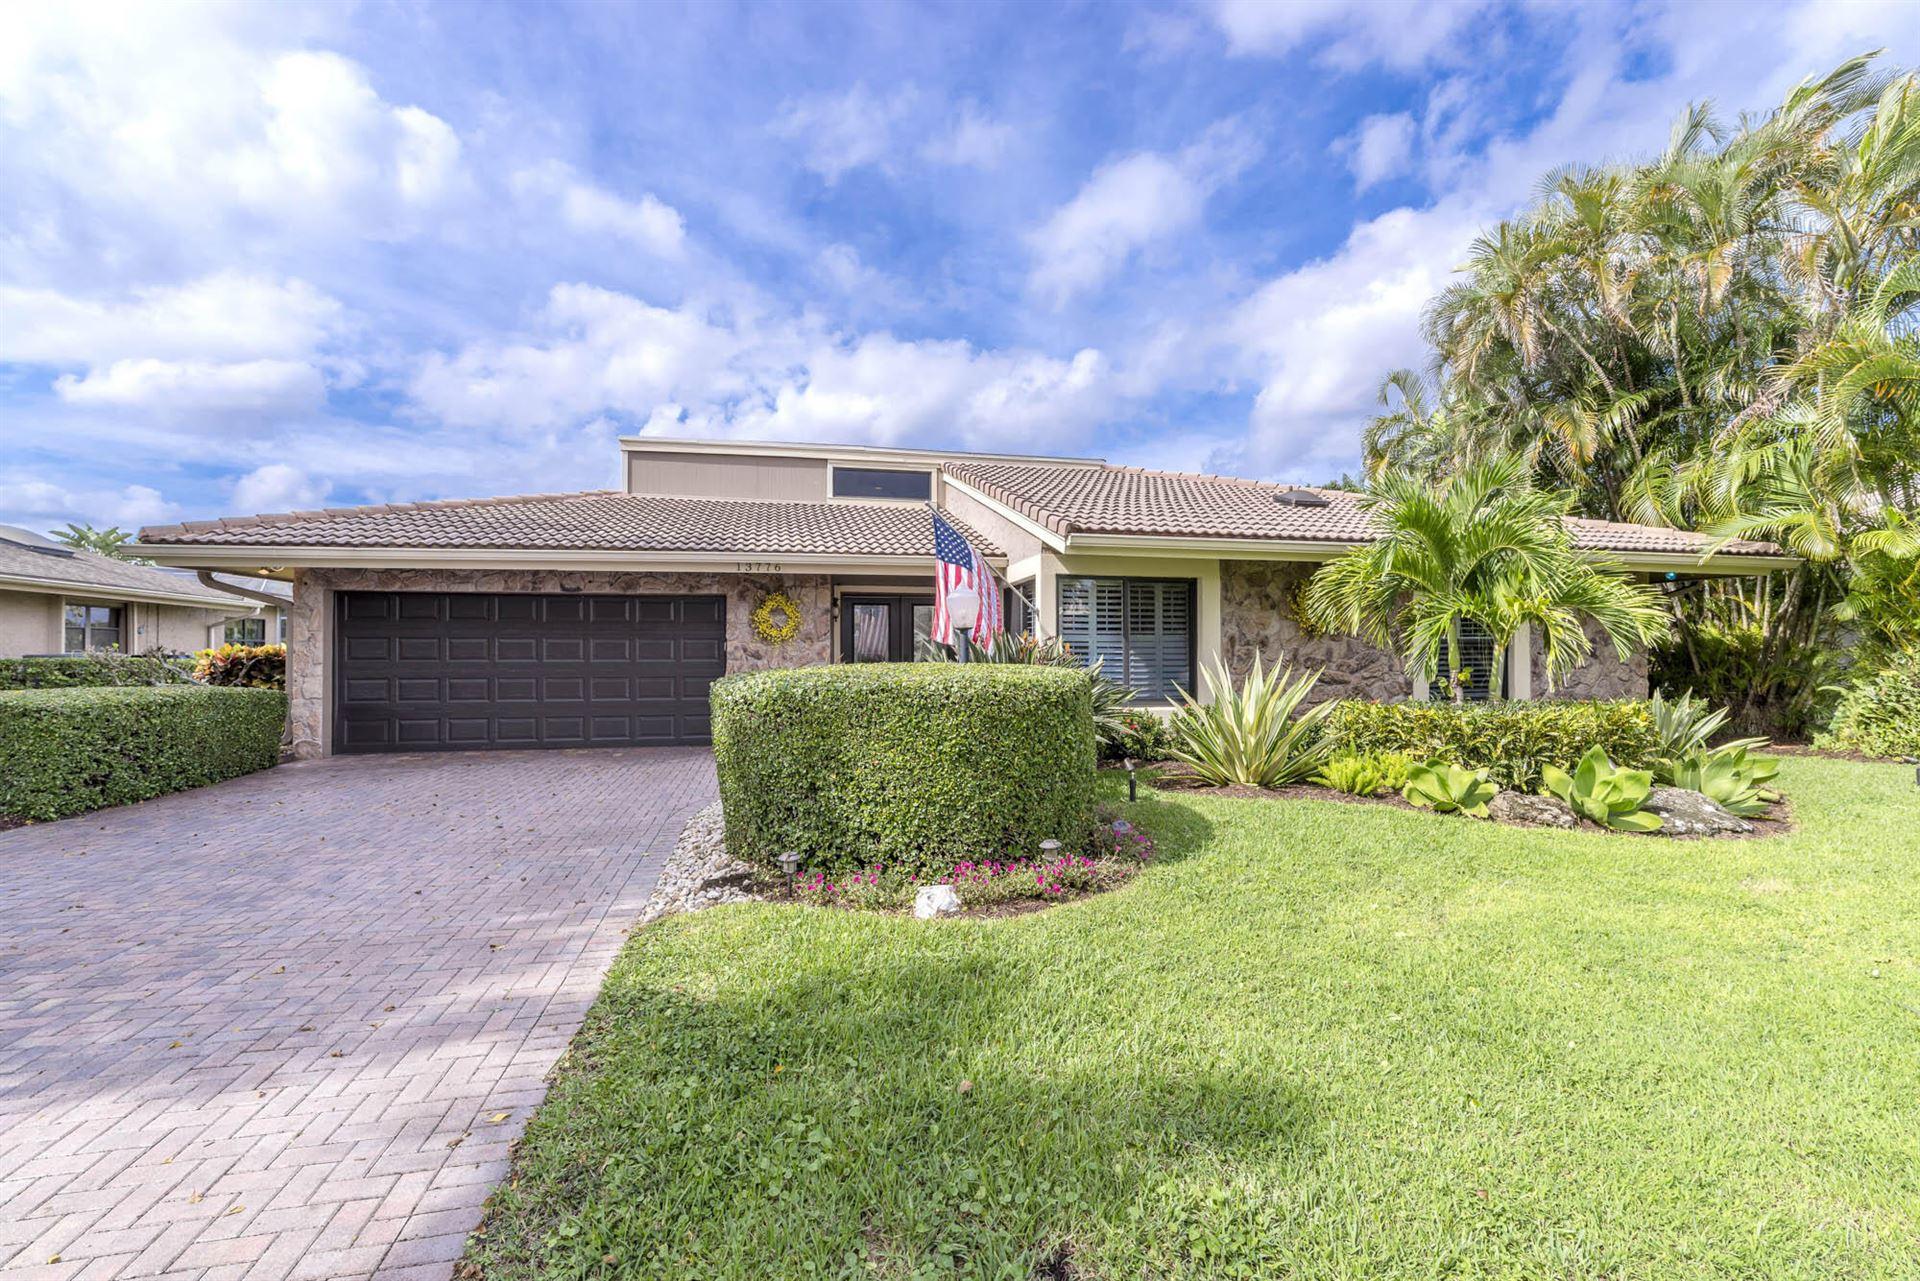 13776 Sand Crane Drive, West Palm Beach, FL 33418 - MLS#: RX-10753842